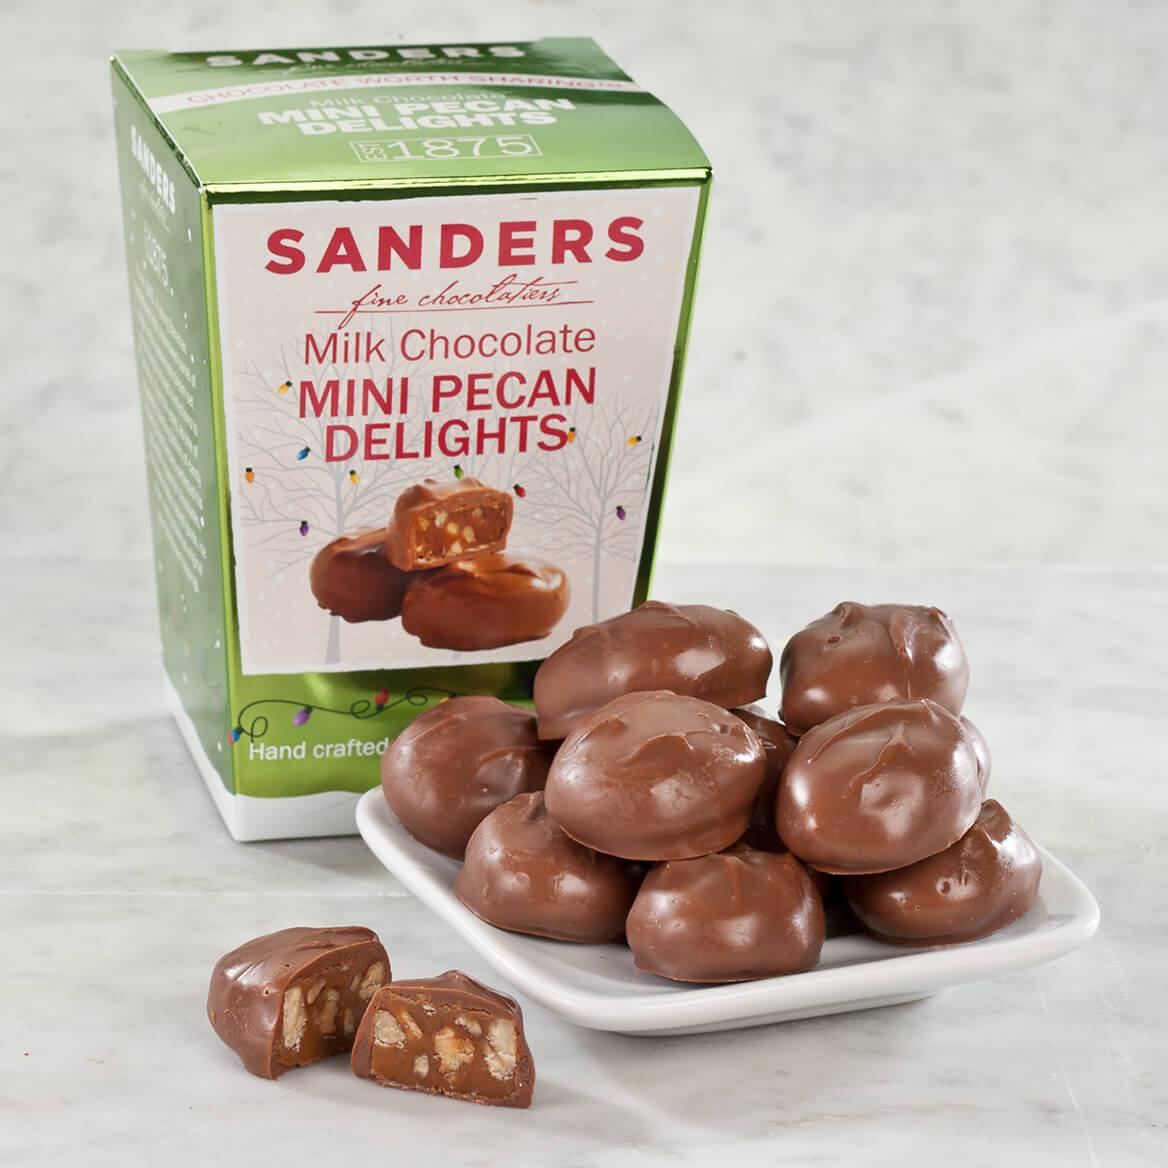 Sanders® Milk Chocolate Mini Pecan Delights, 6 oz.-353548